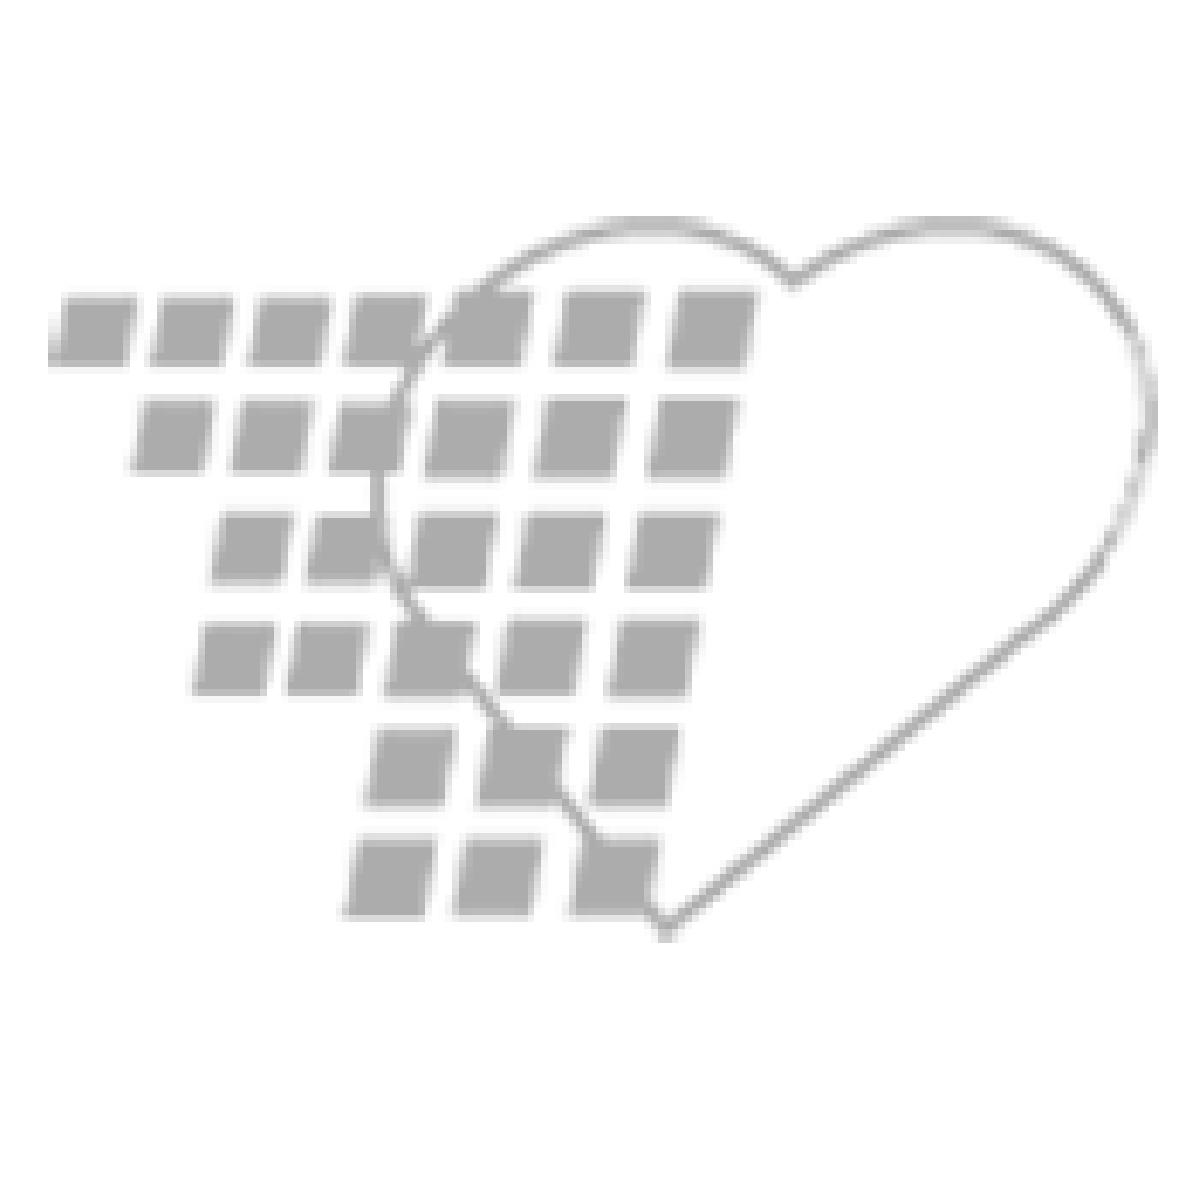 05-PK-3342 4 x 4 * ply Gauze, Non Sterile - 5/Pack